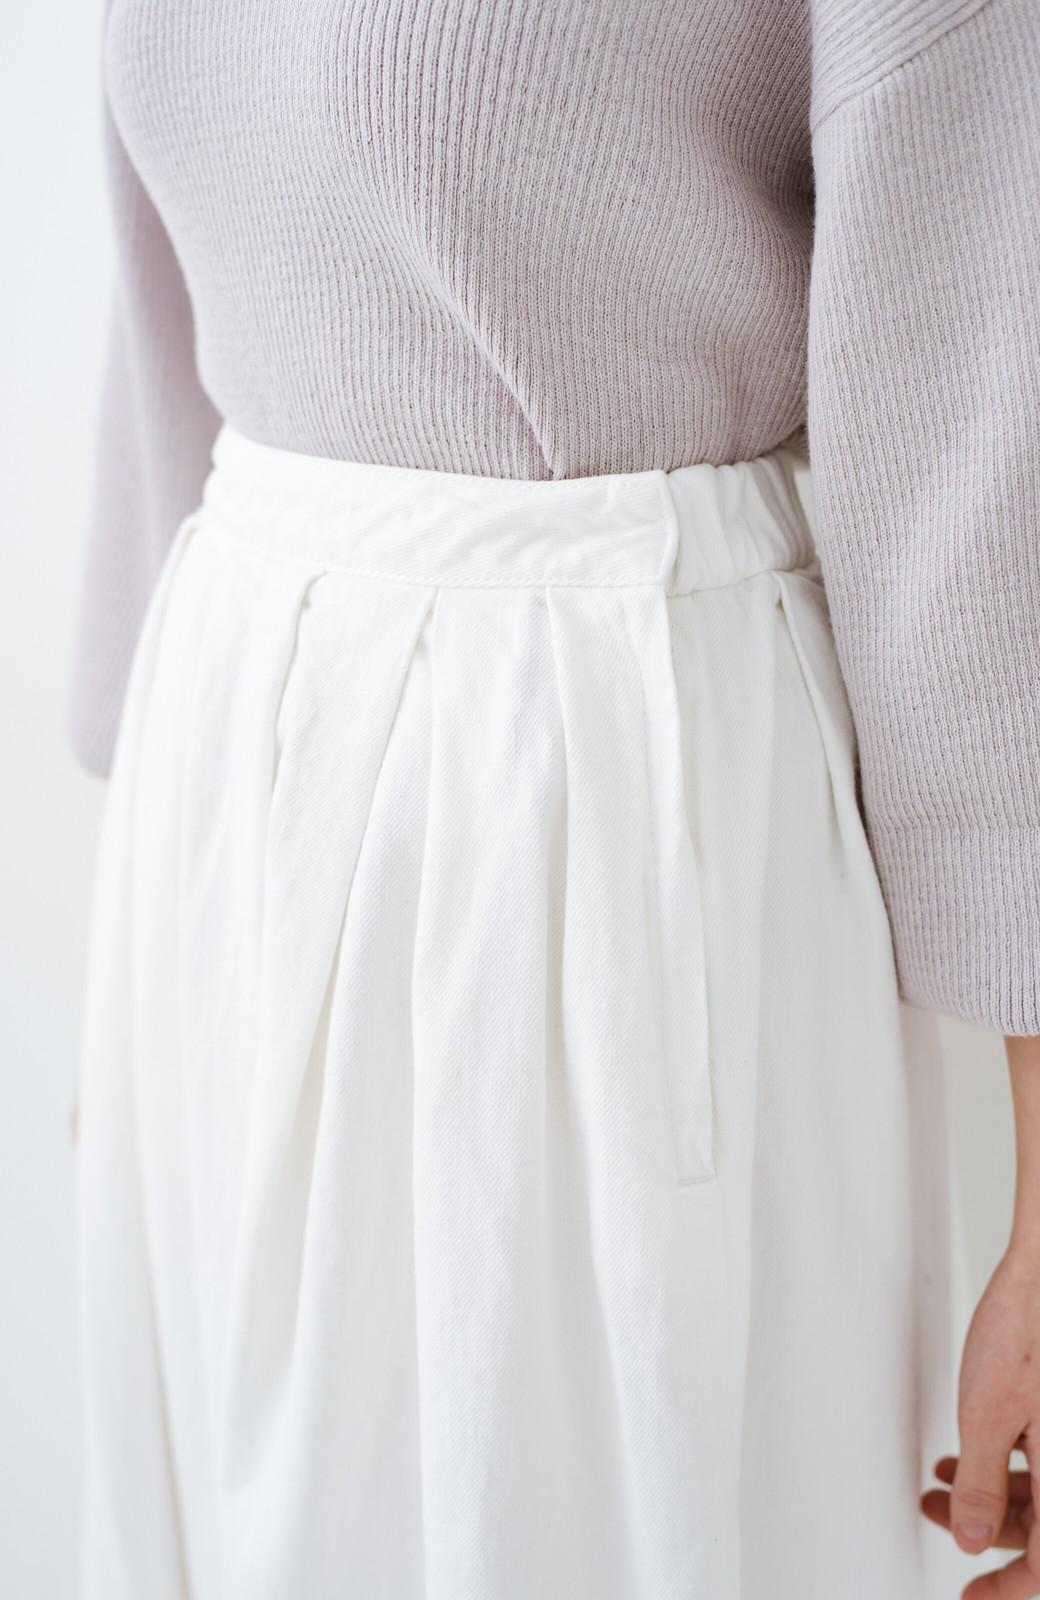 haco! Urvin 伊藤信子×sayurinishikuboコラボ tann'sスカート <ホワイト>の商品写真6